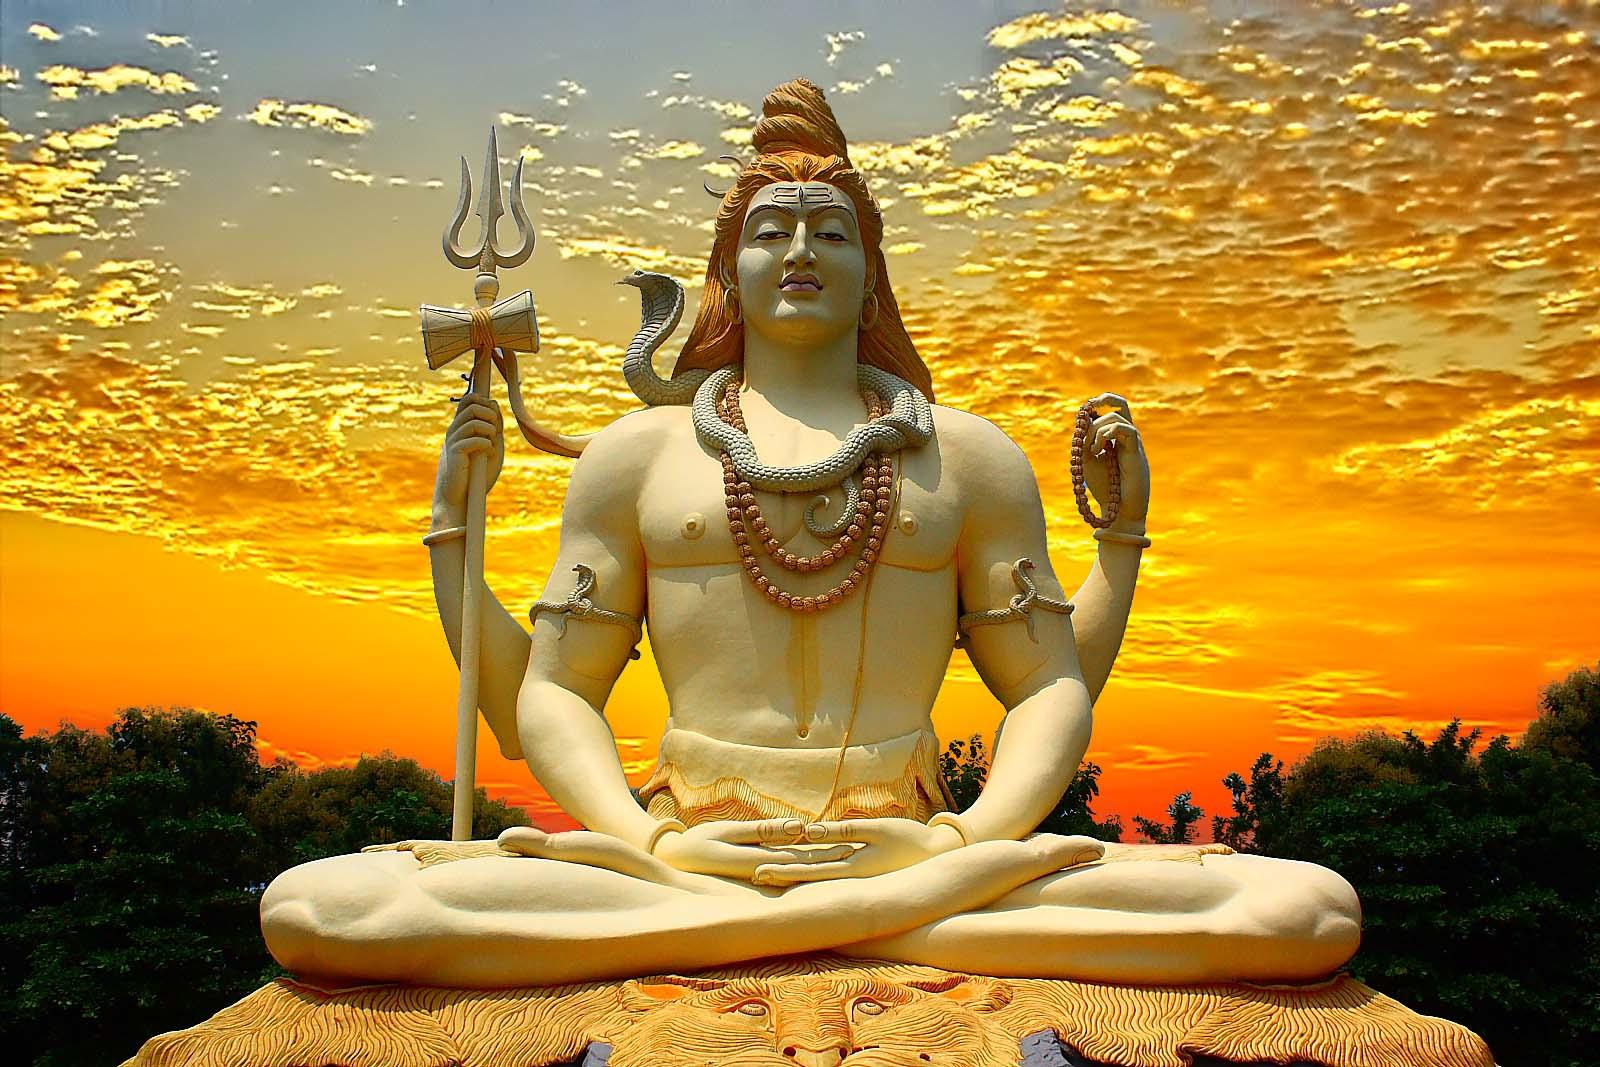 lord krishna hd wallpapers 1080p free download